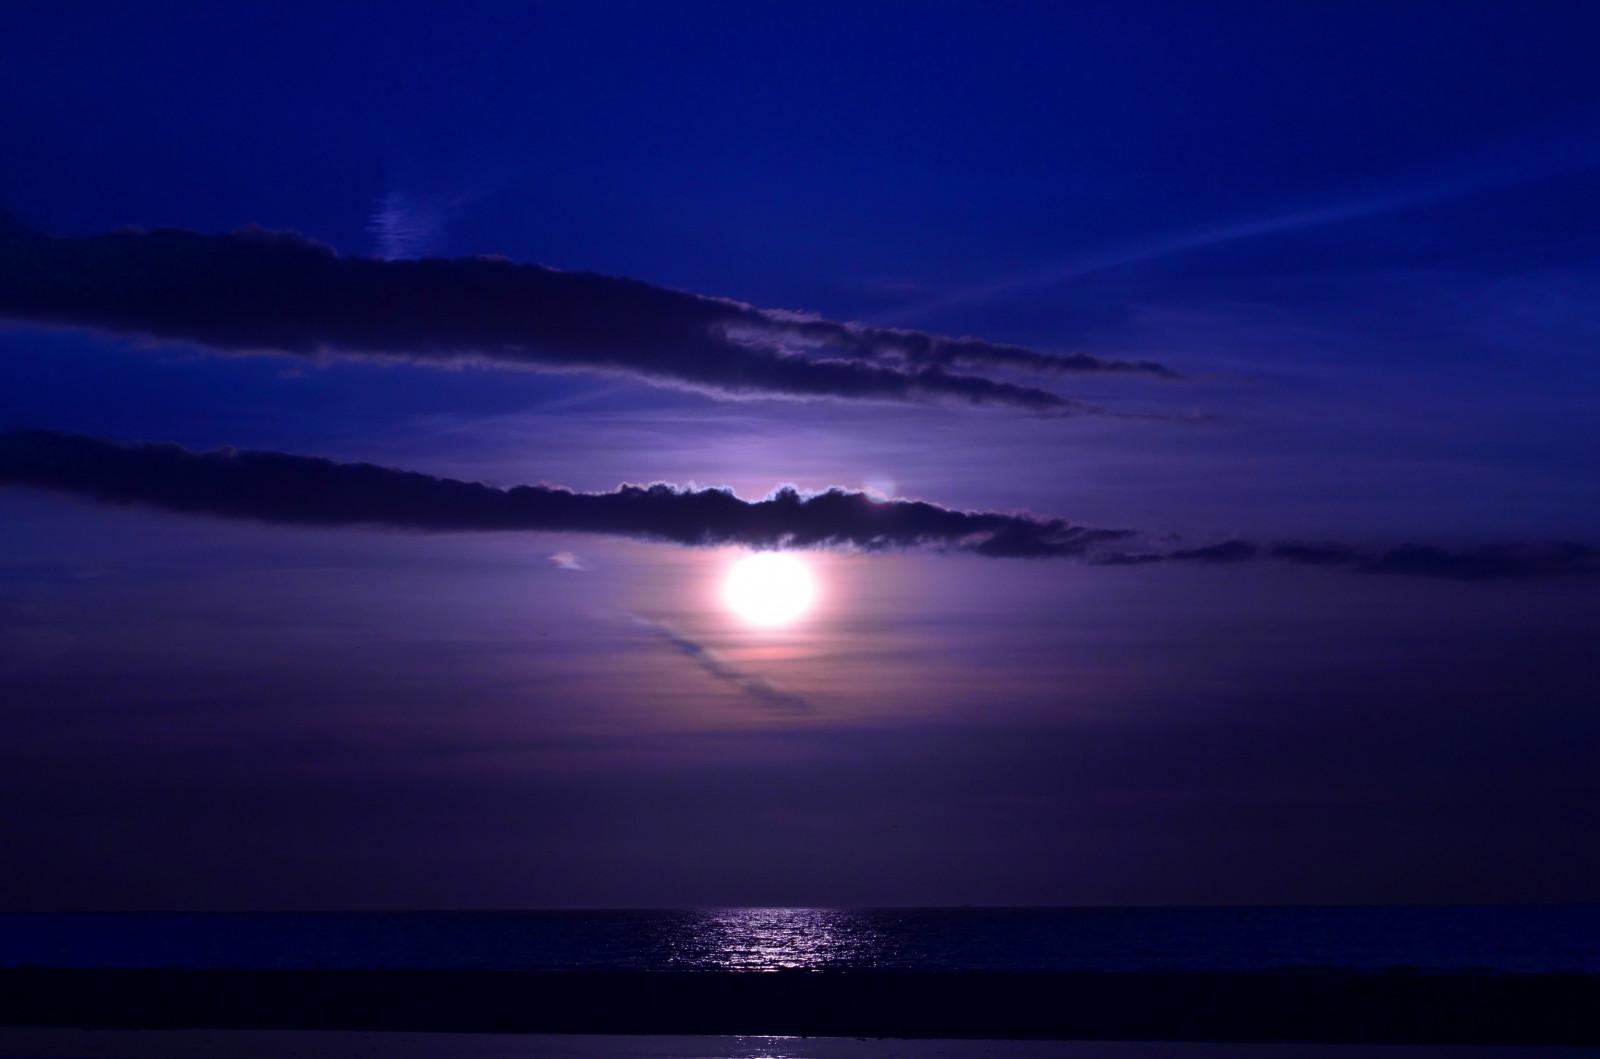 Открытки доброе, картинки вечер море и луна